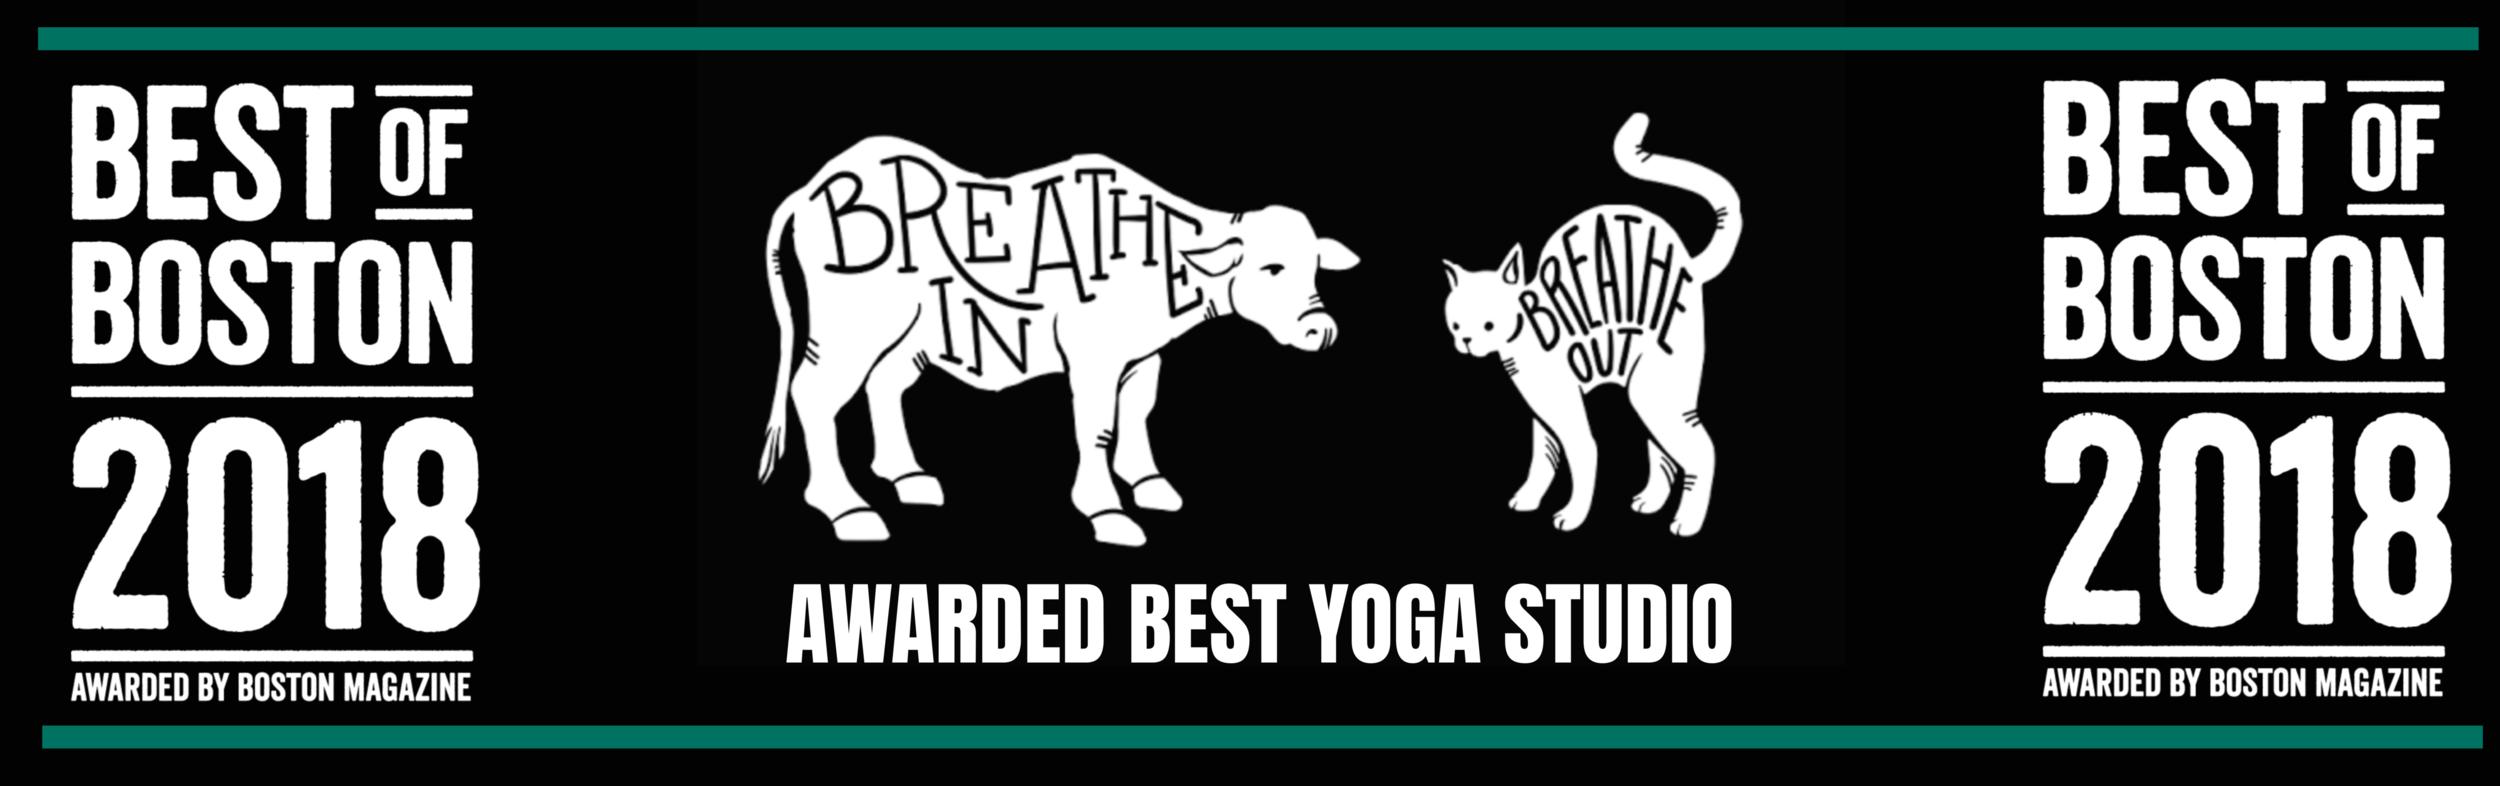 best-yoga-studio-boston